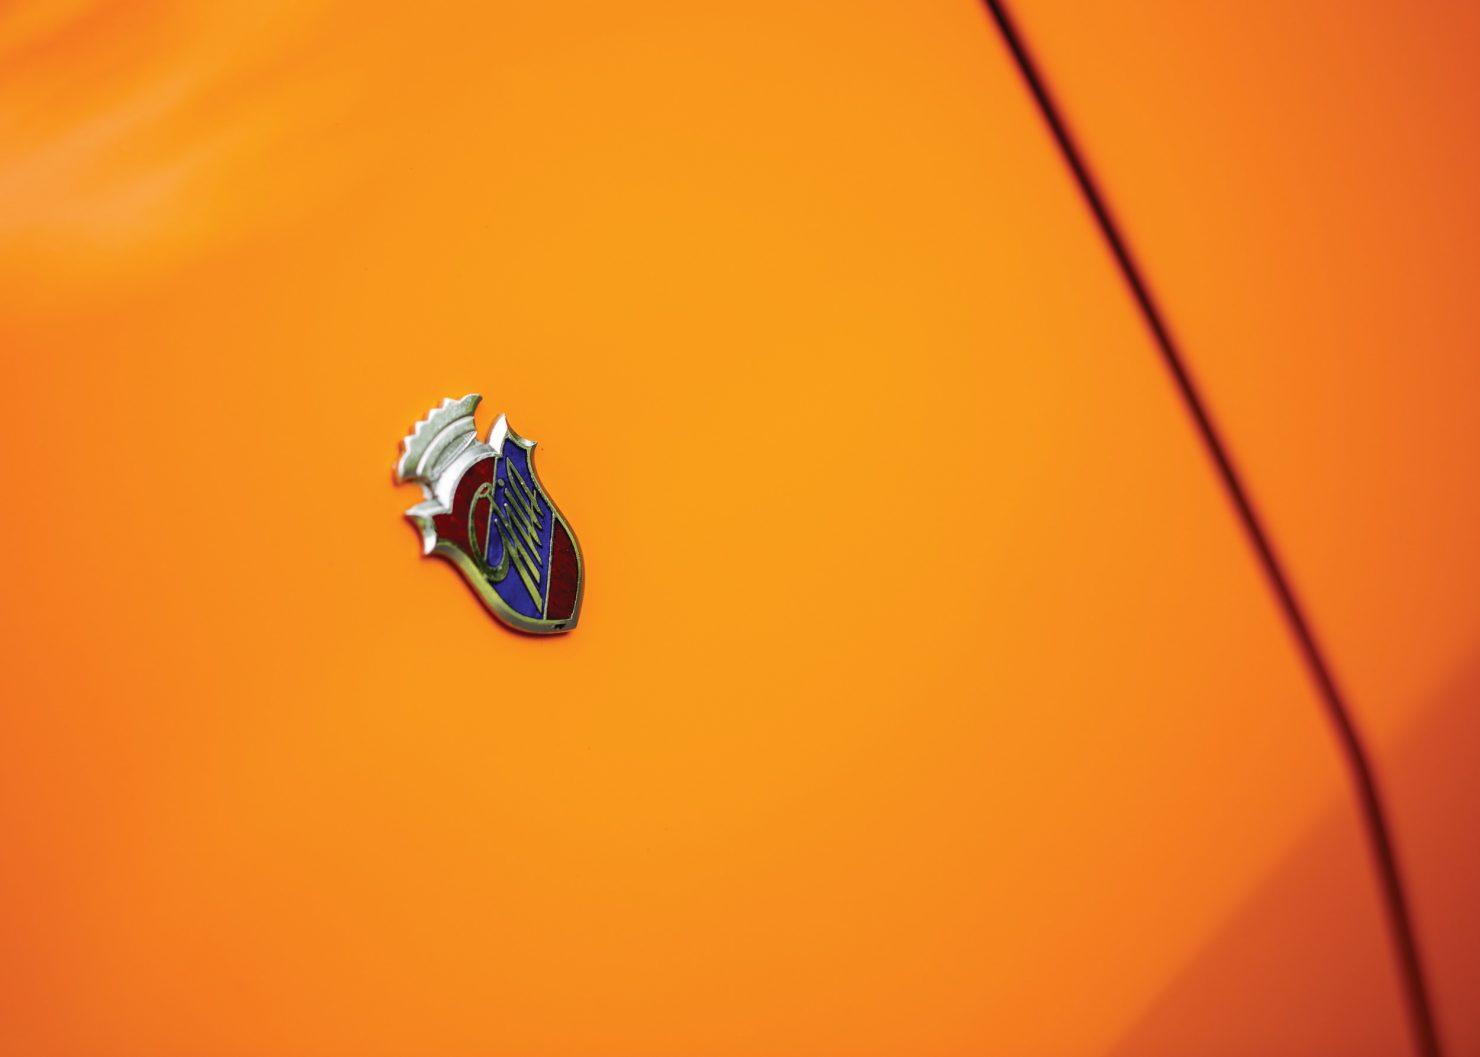 de tomaso pantera 7 1480x1057 - The Last American De Tomaso Pantera